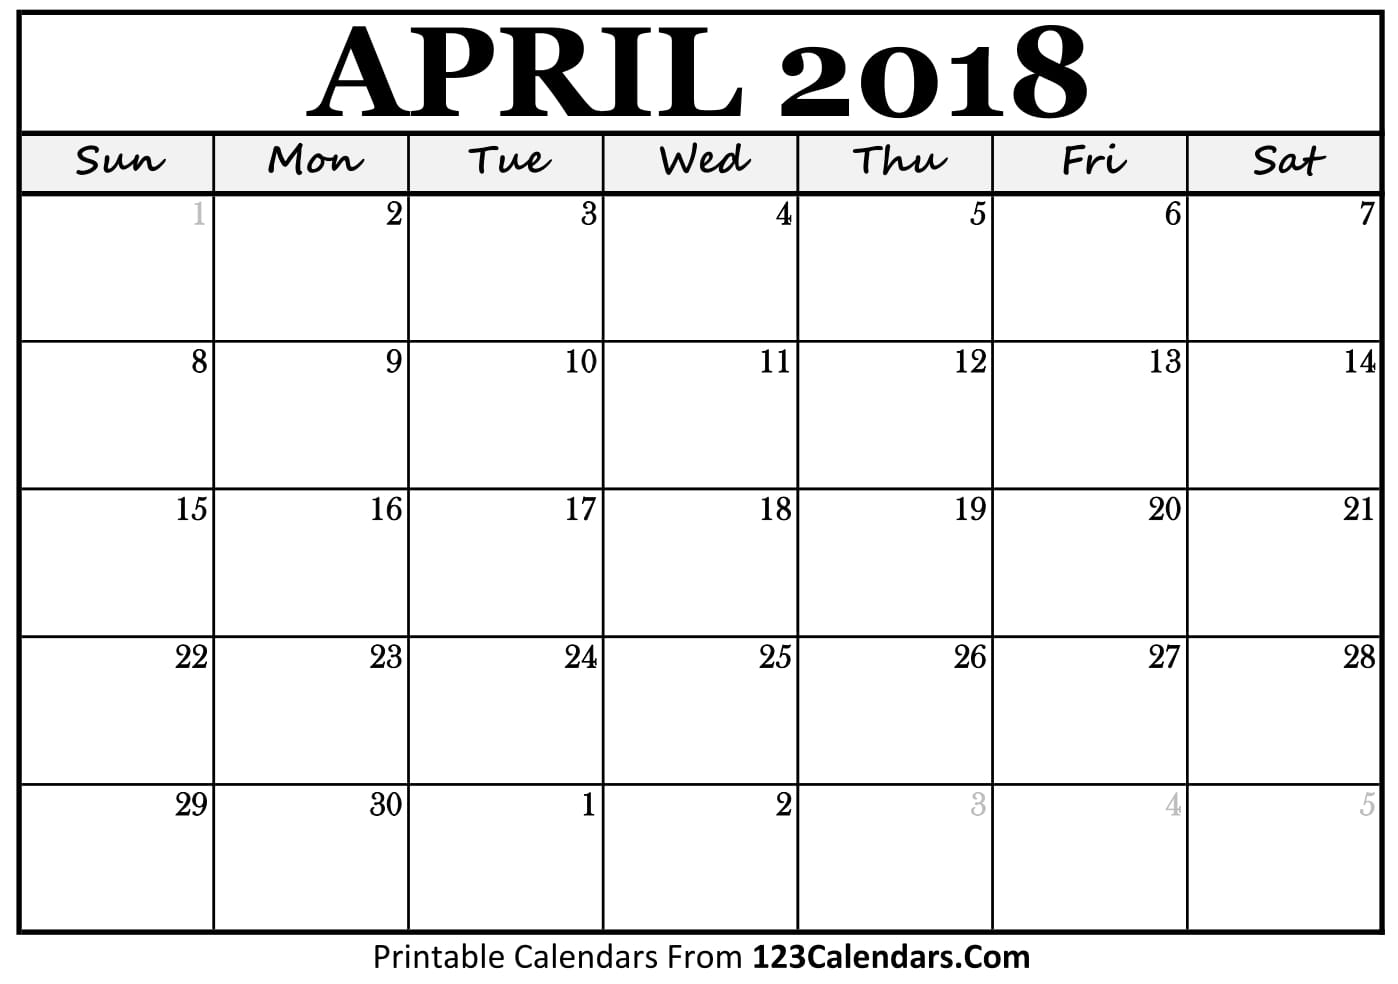 Printable Calendar April